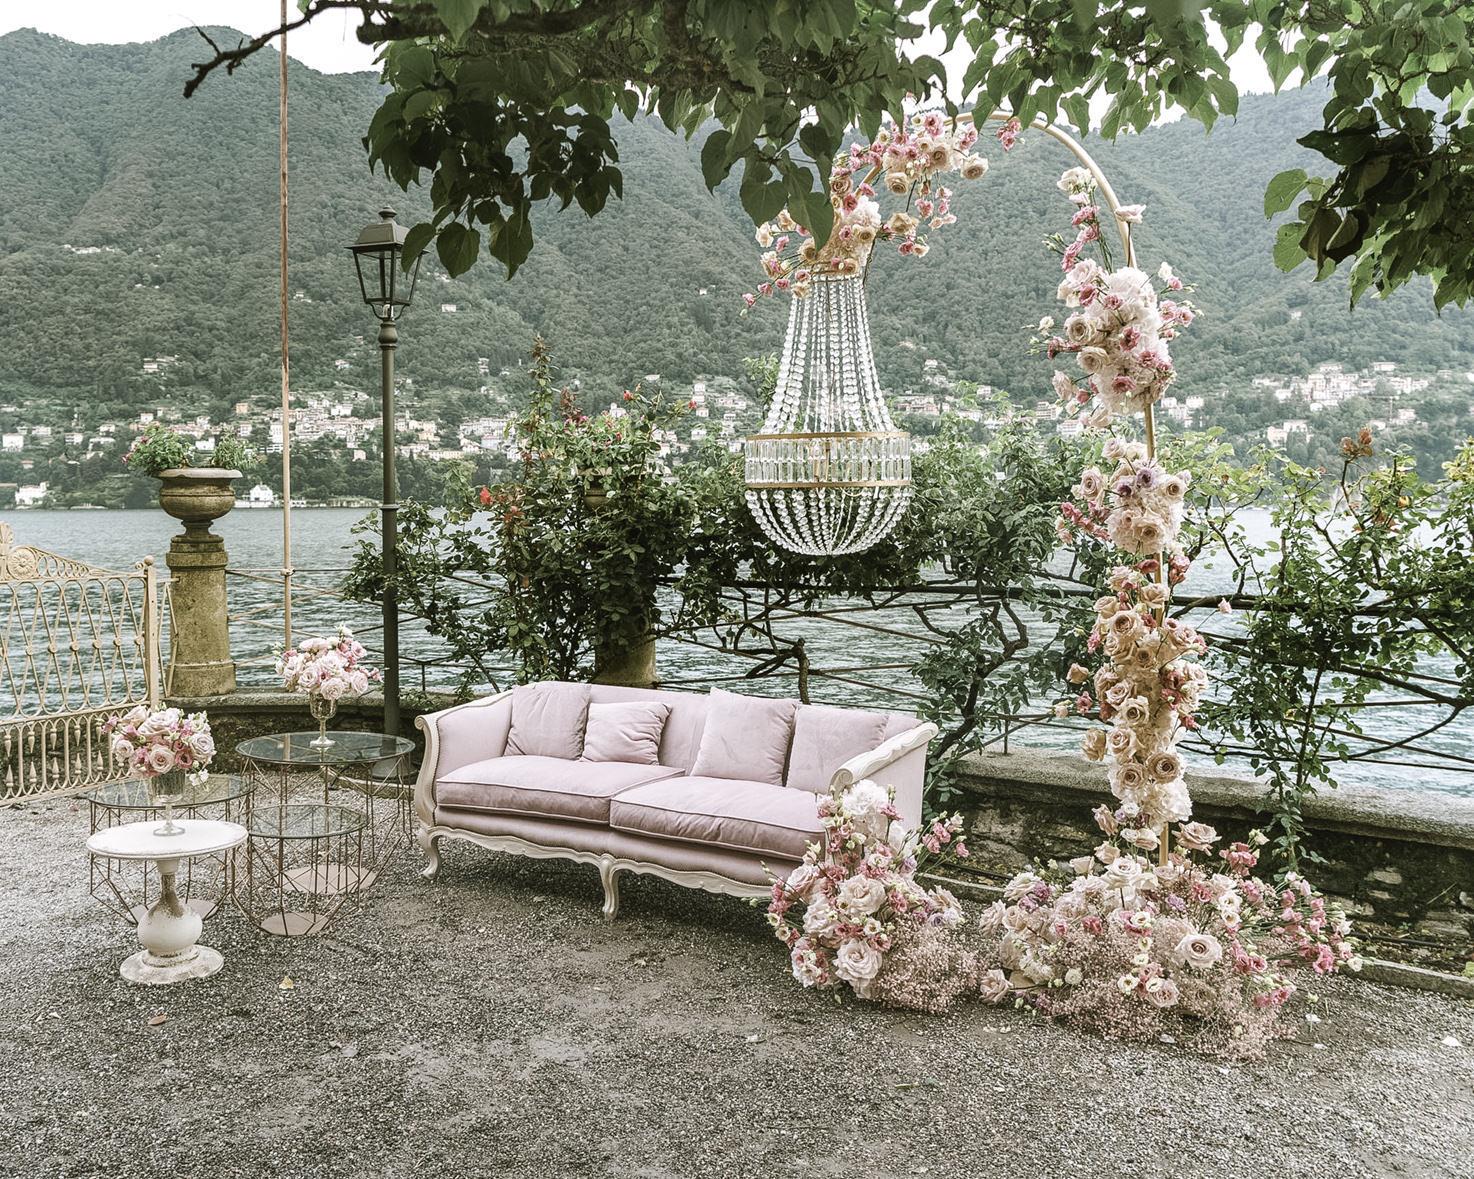 Garden setting for wedding aperitif